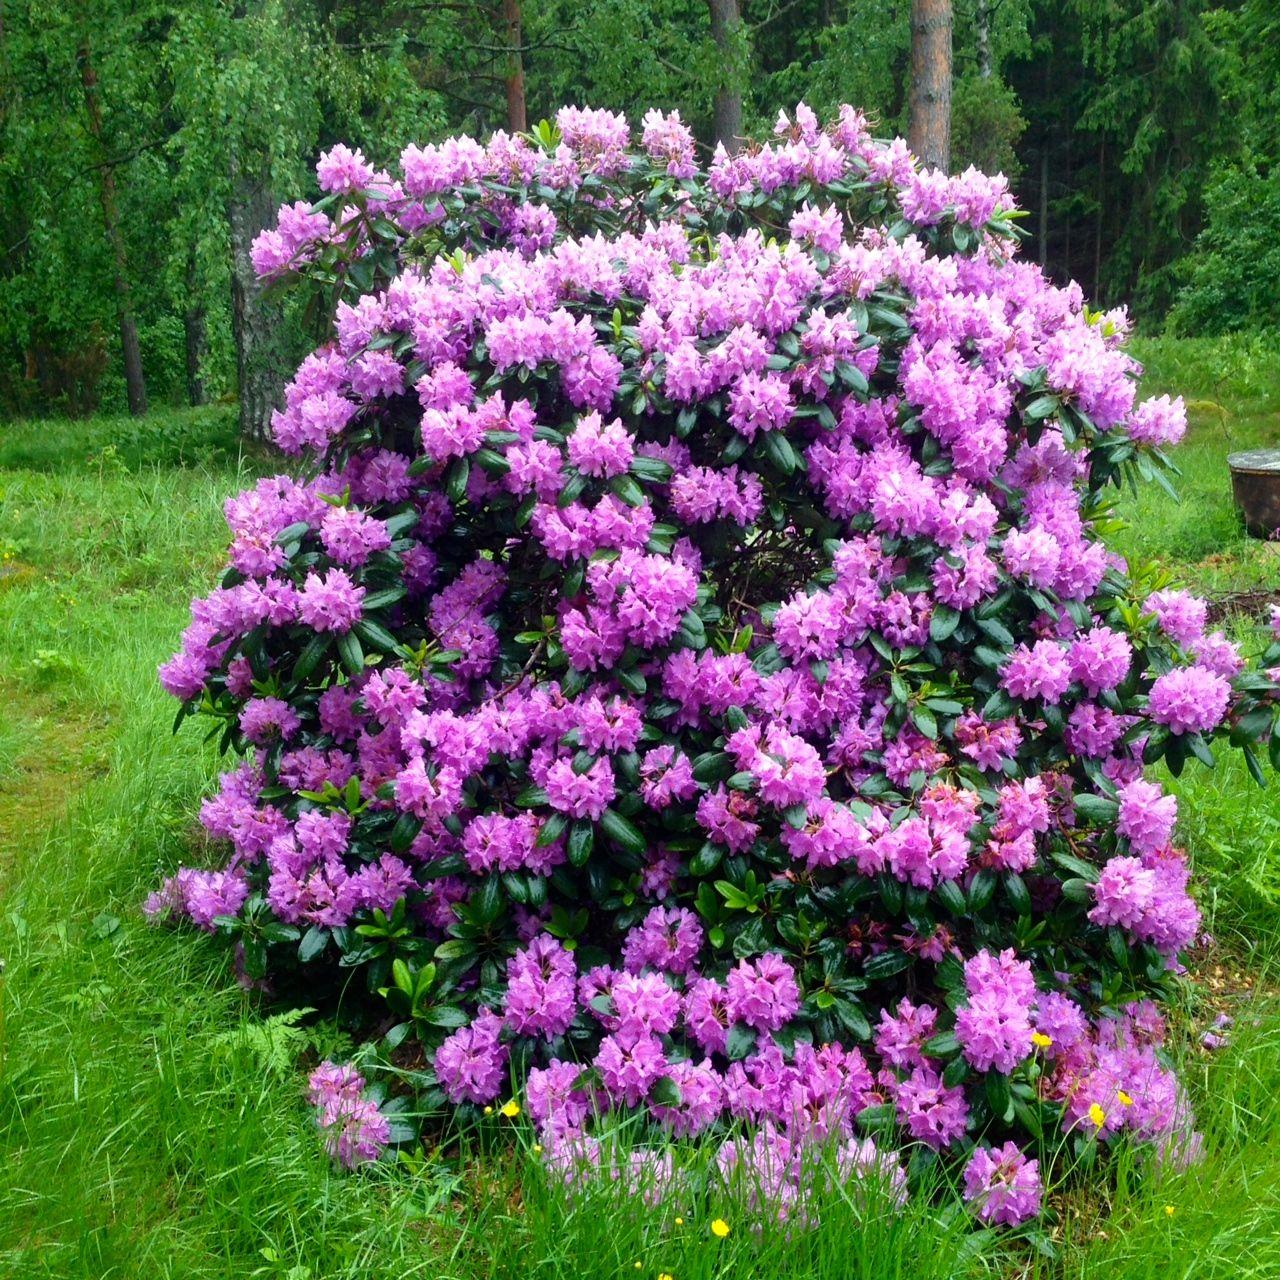 Rhododhendron